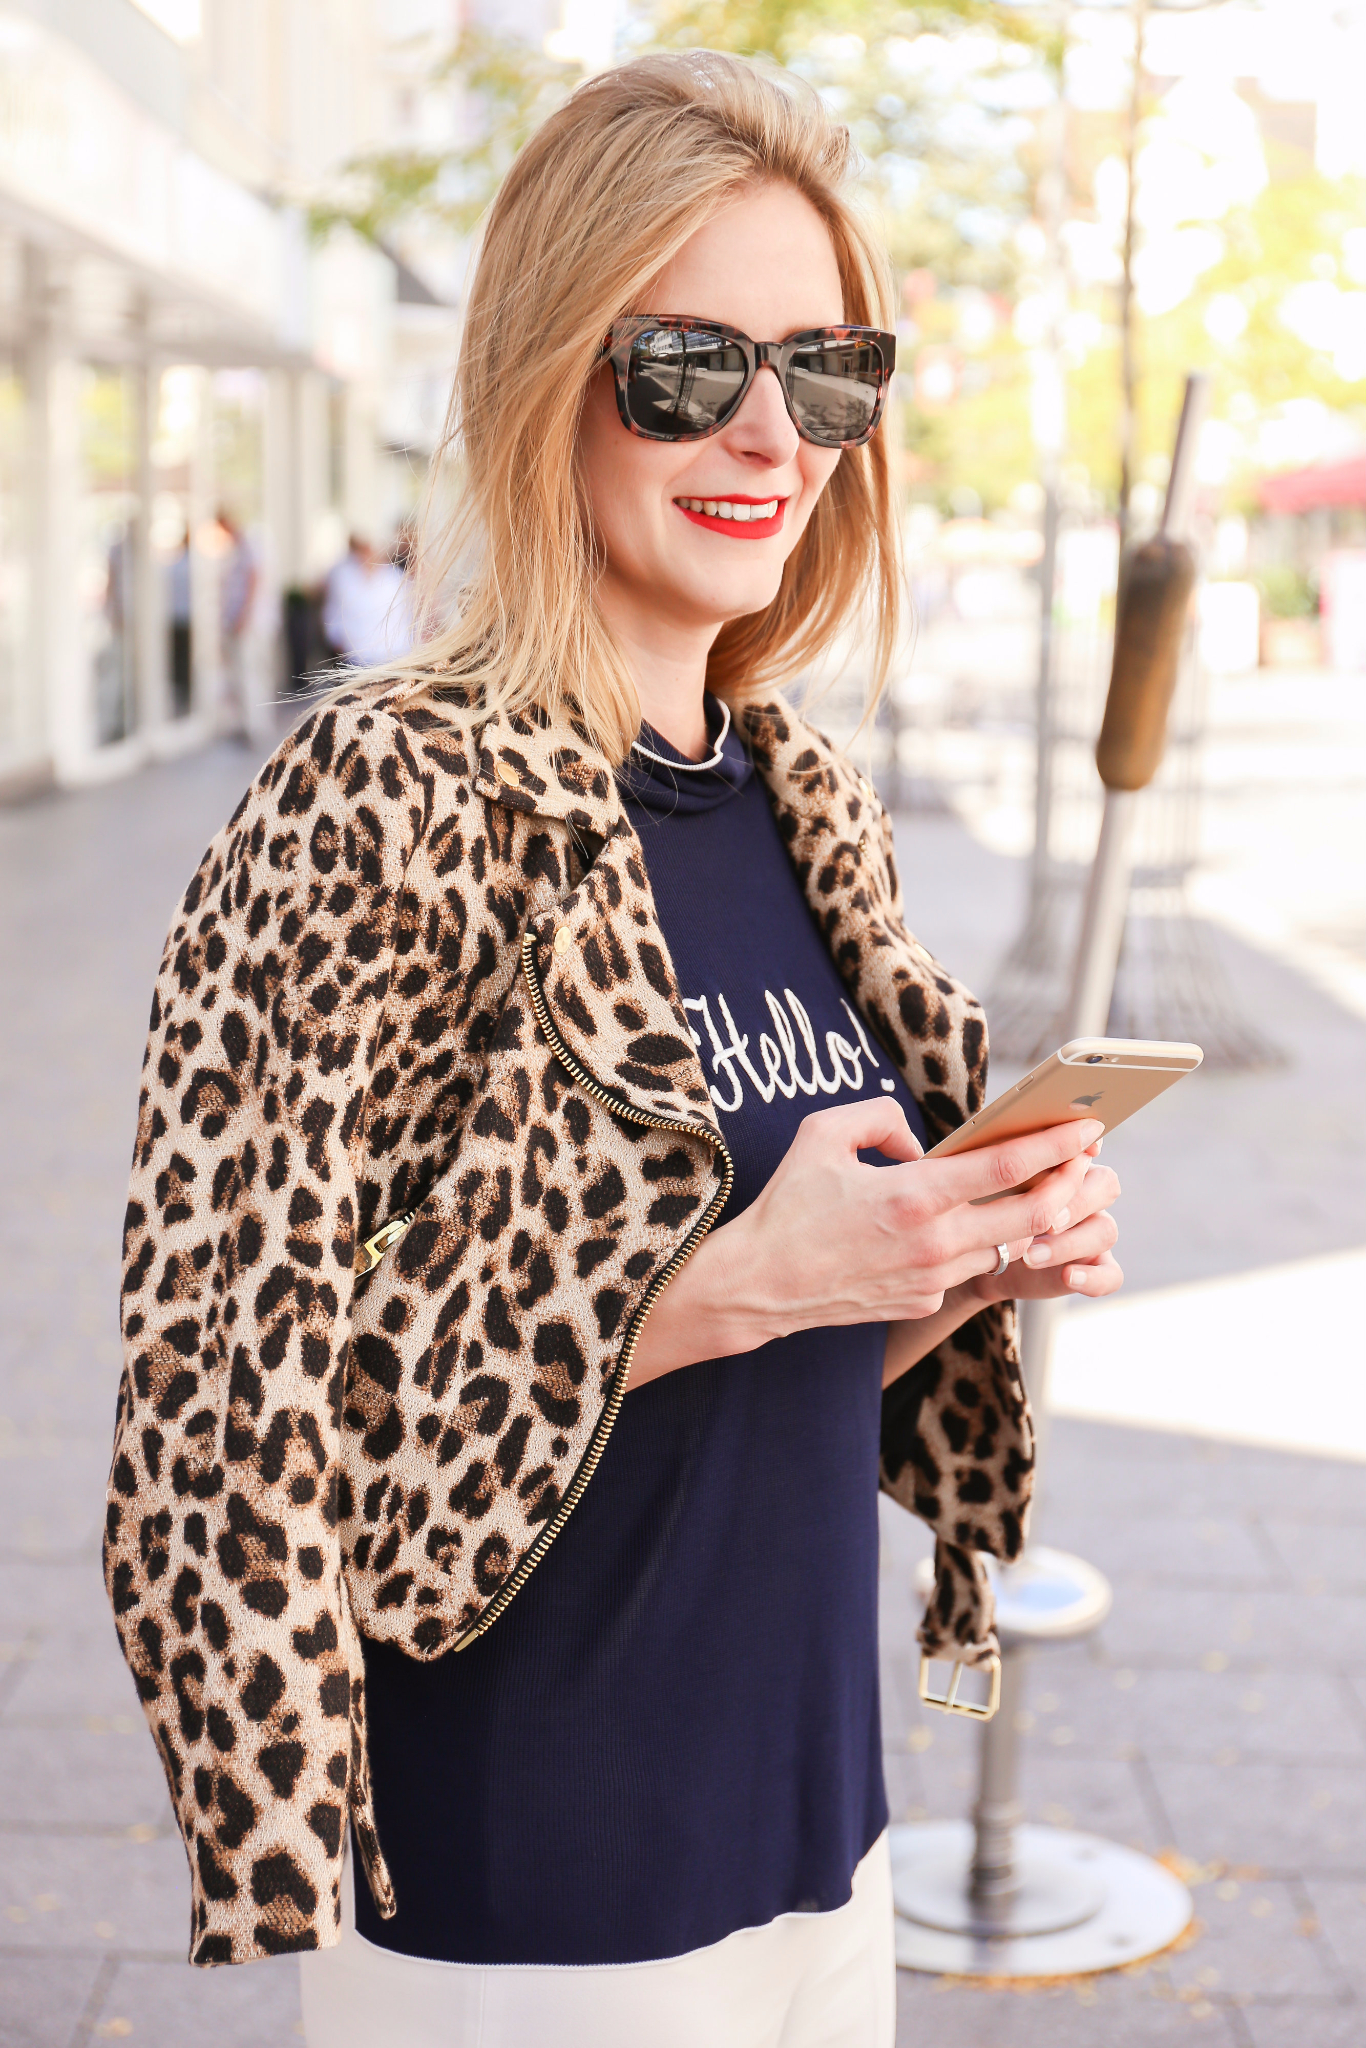 MOD-by-Monique-Looks-Leopard-Print-Gucci-Slipper-2